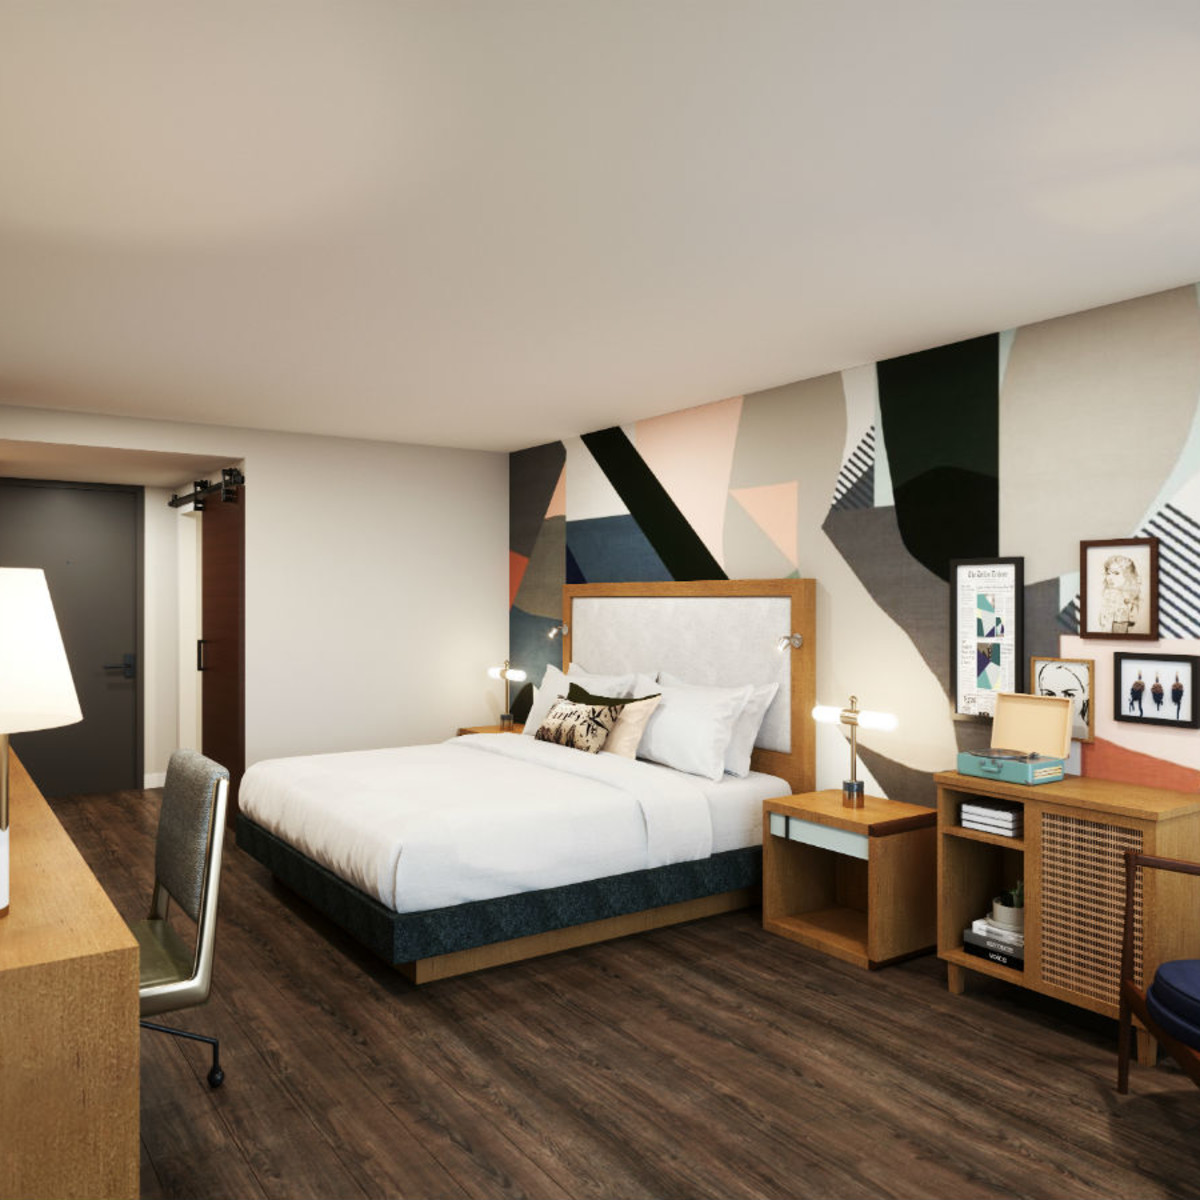 Beeman Hotel